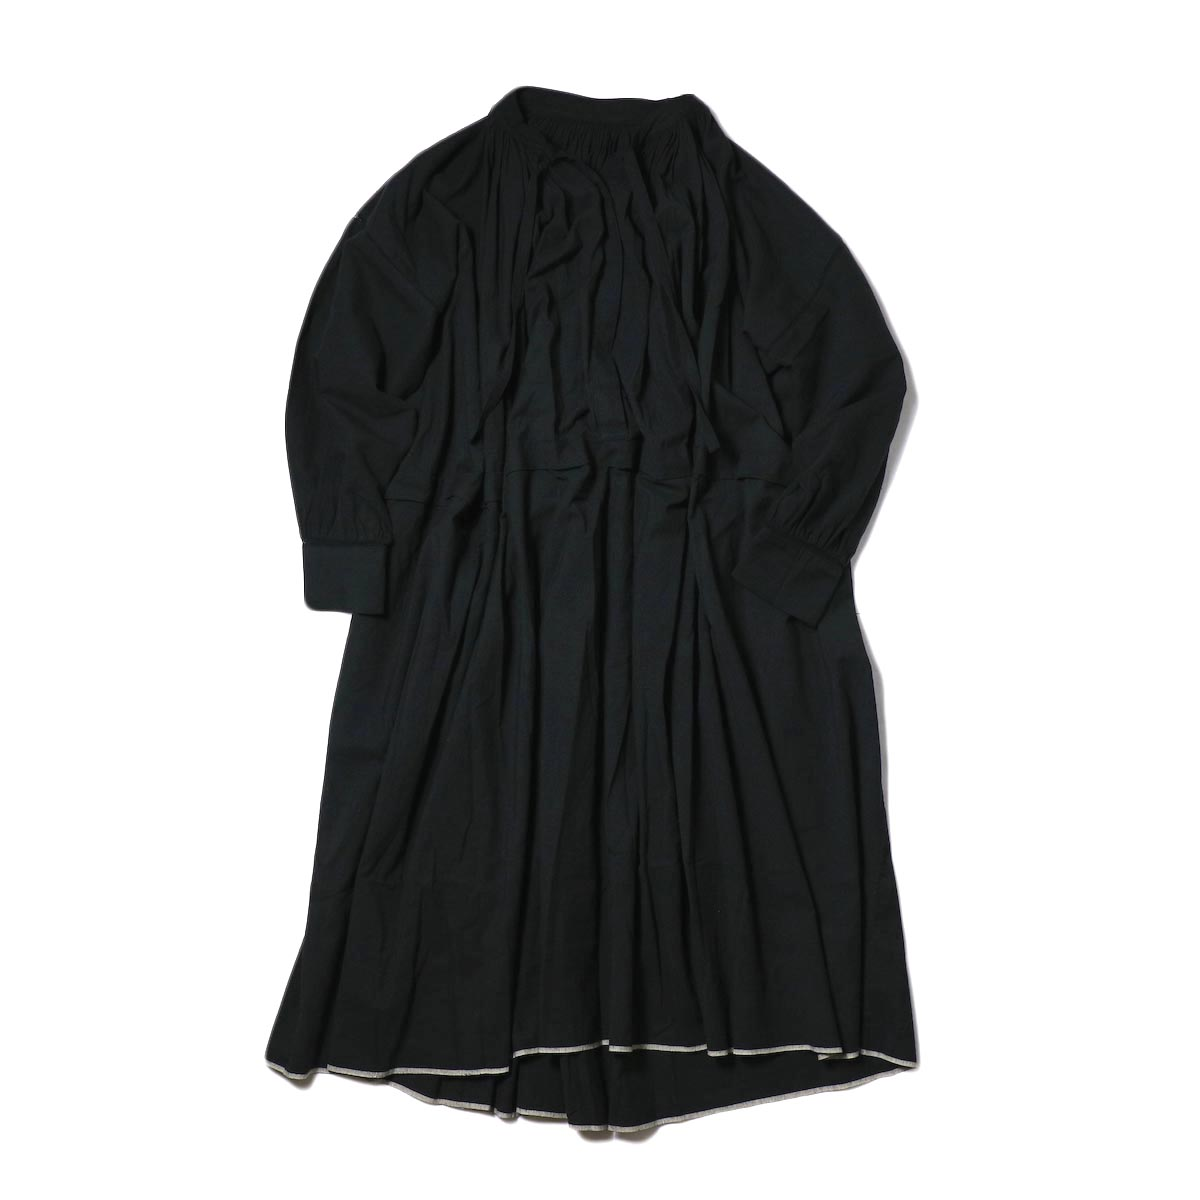 maison de soil / NECK GATHERED DRESS (black)